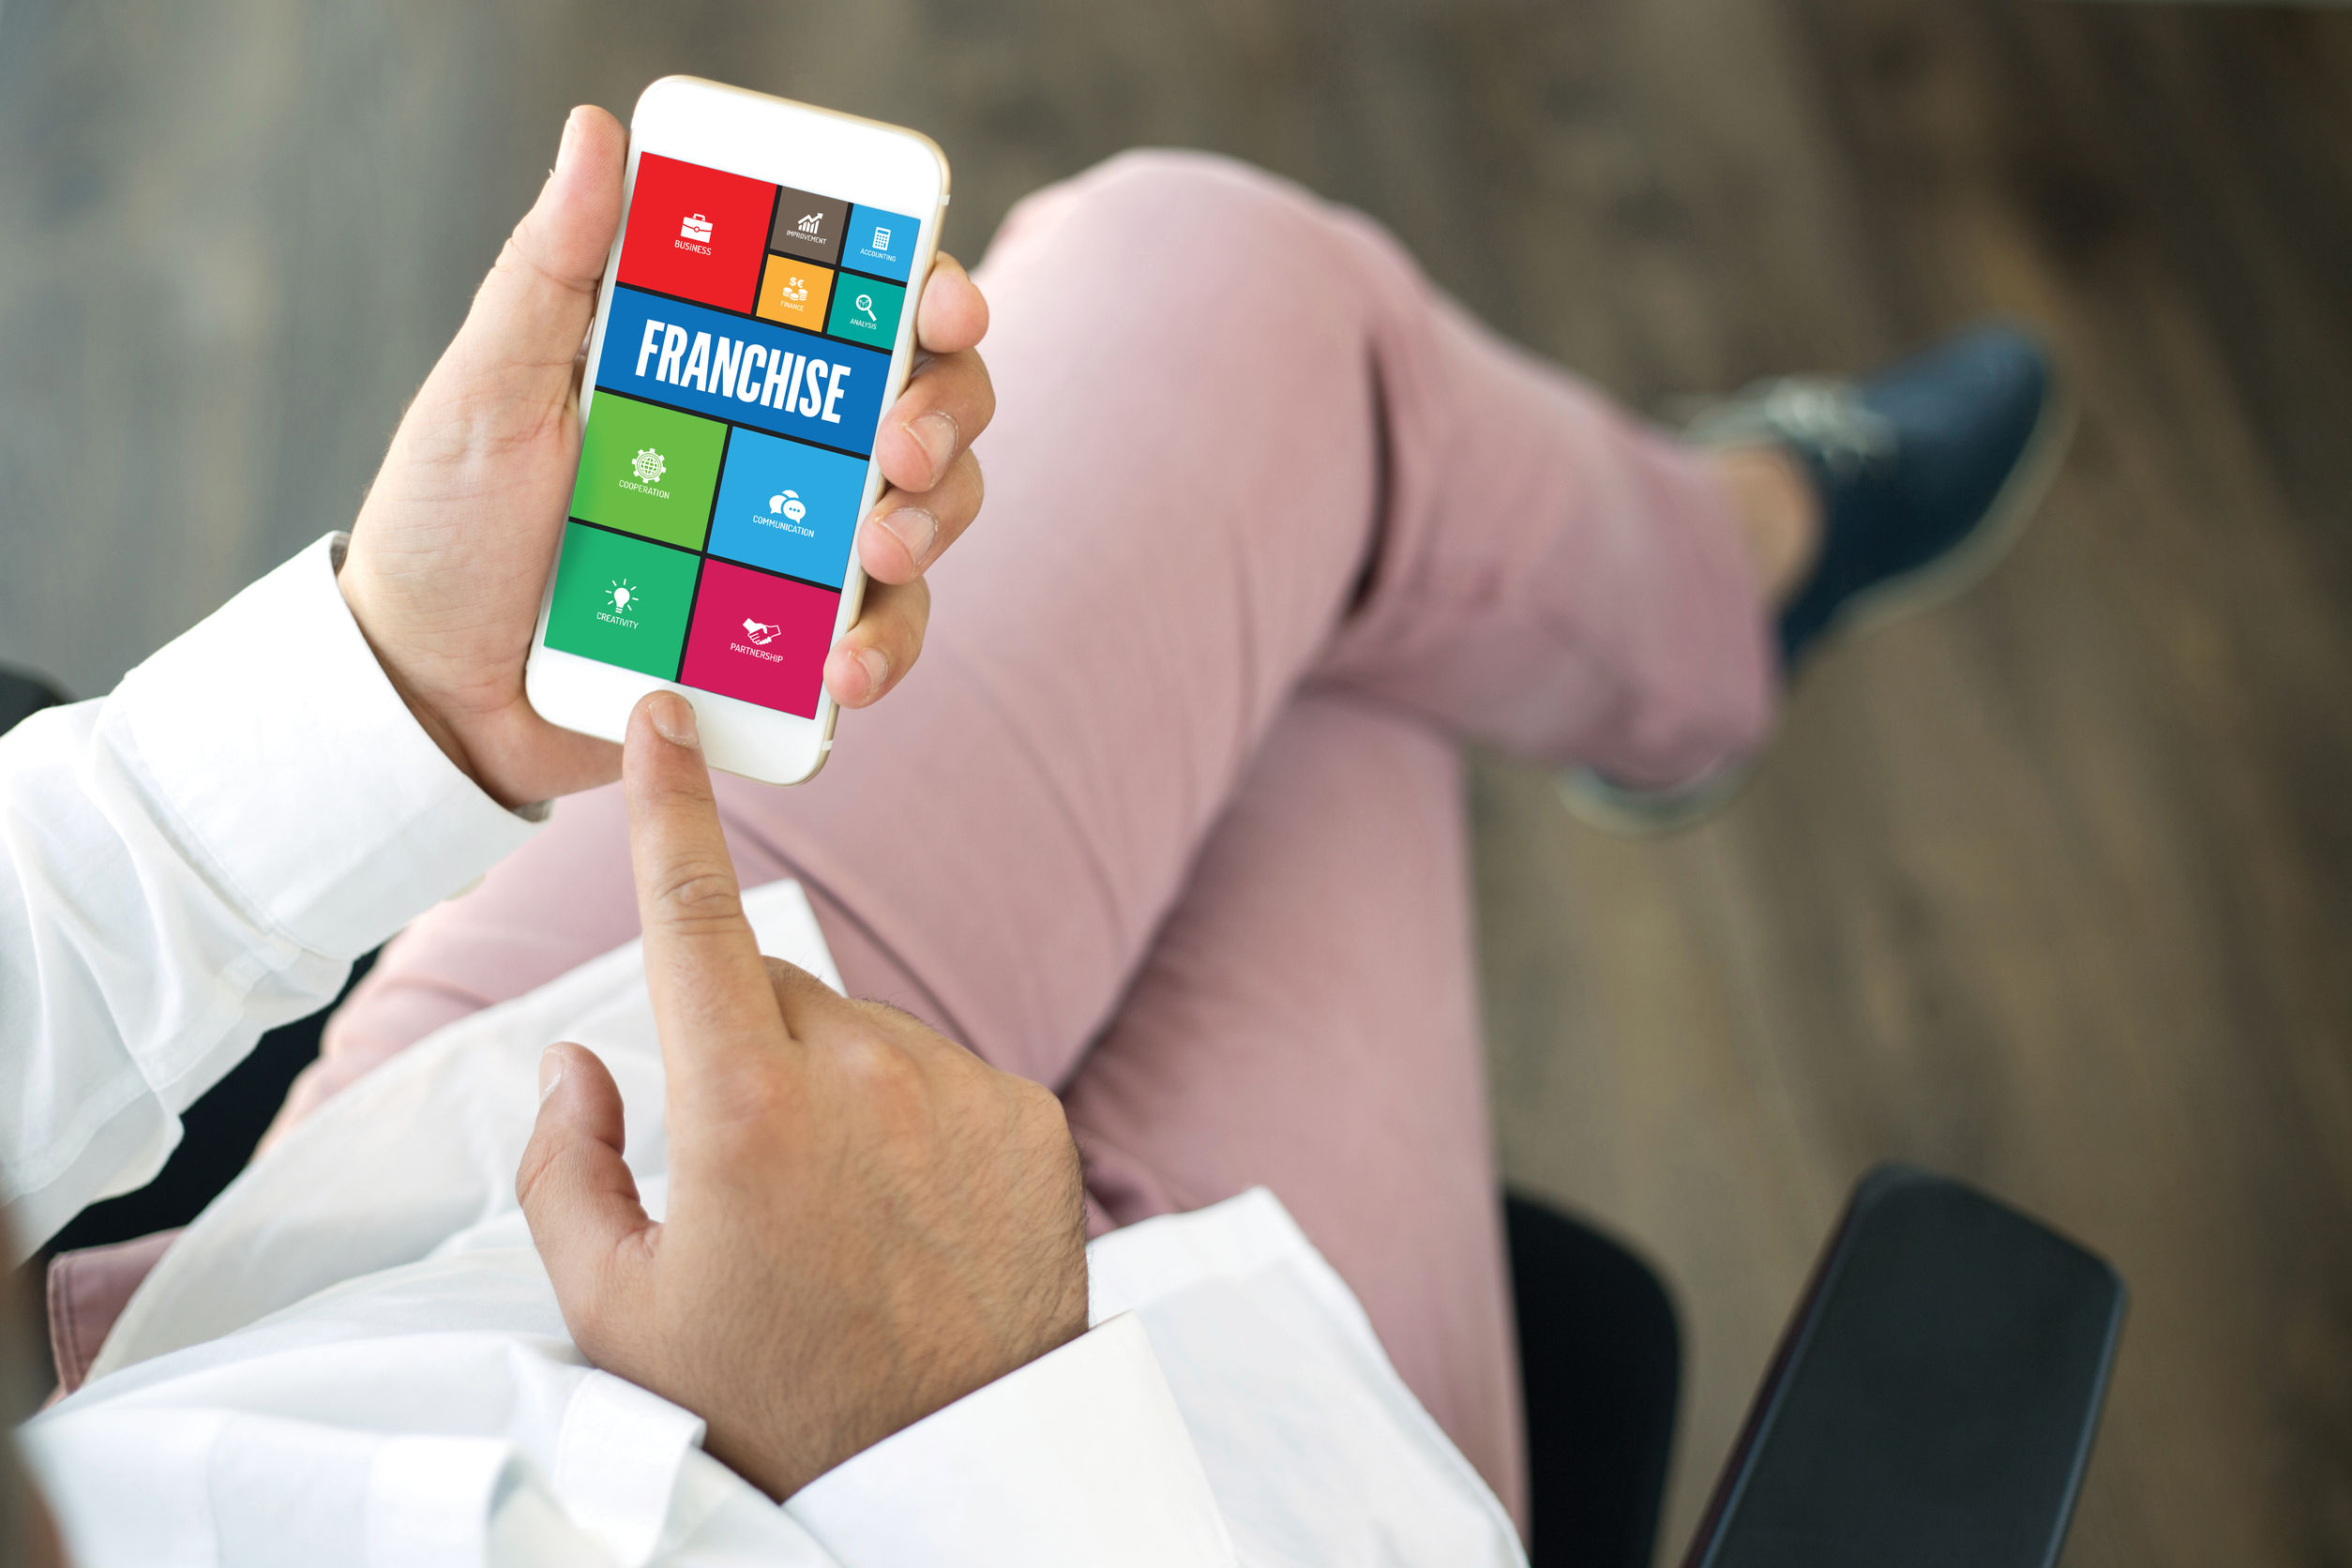 SMS Marketing For Franchise Communication